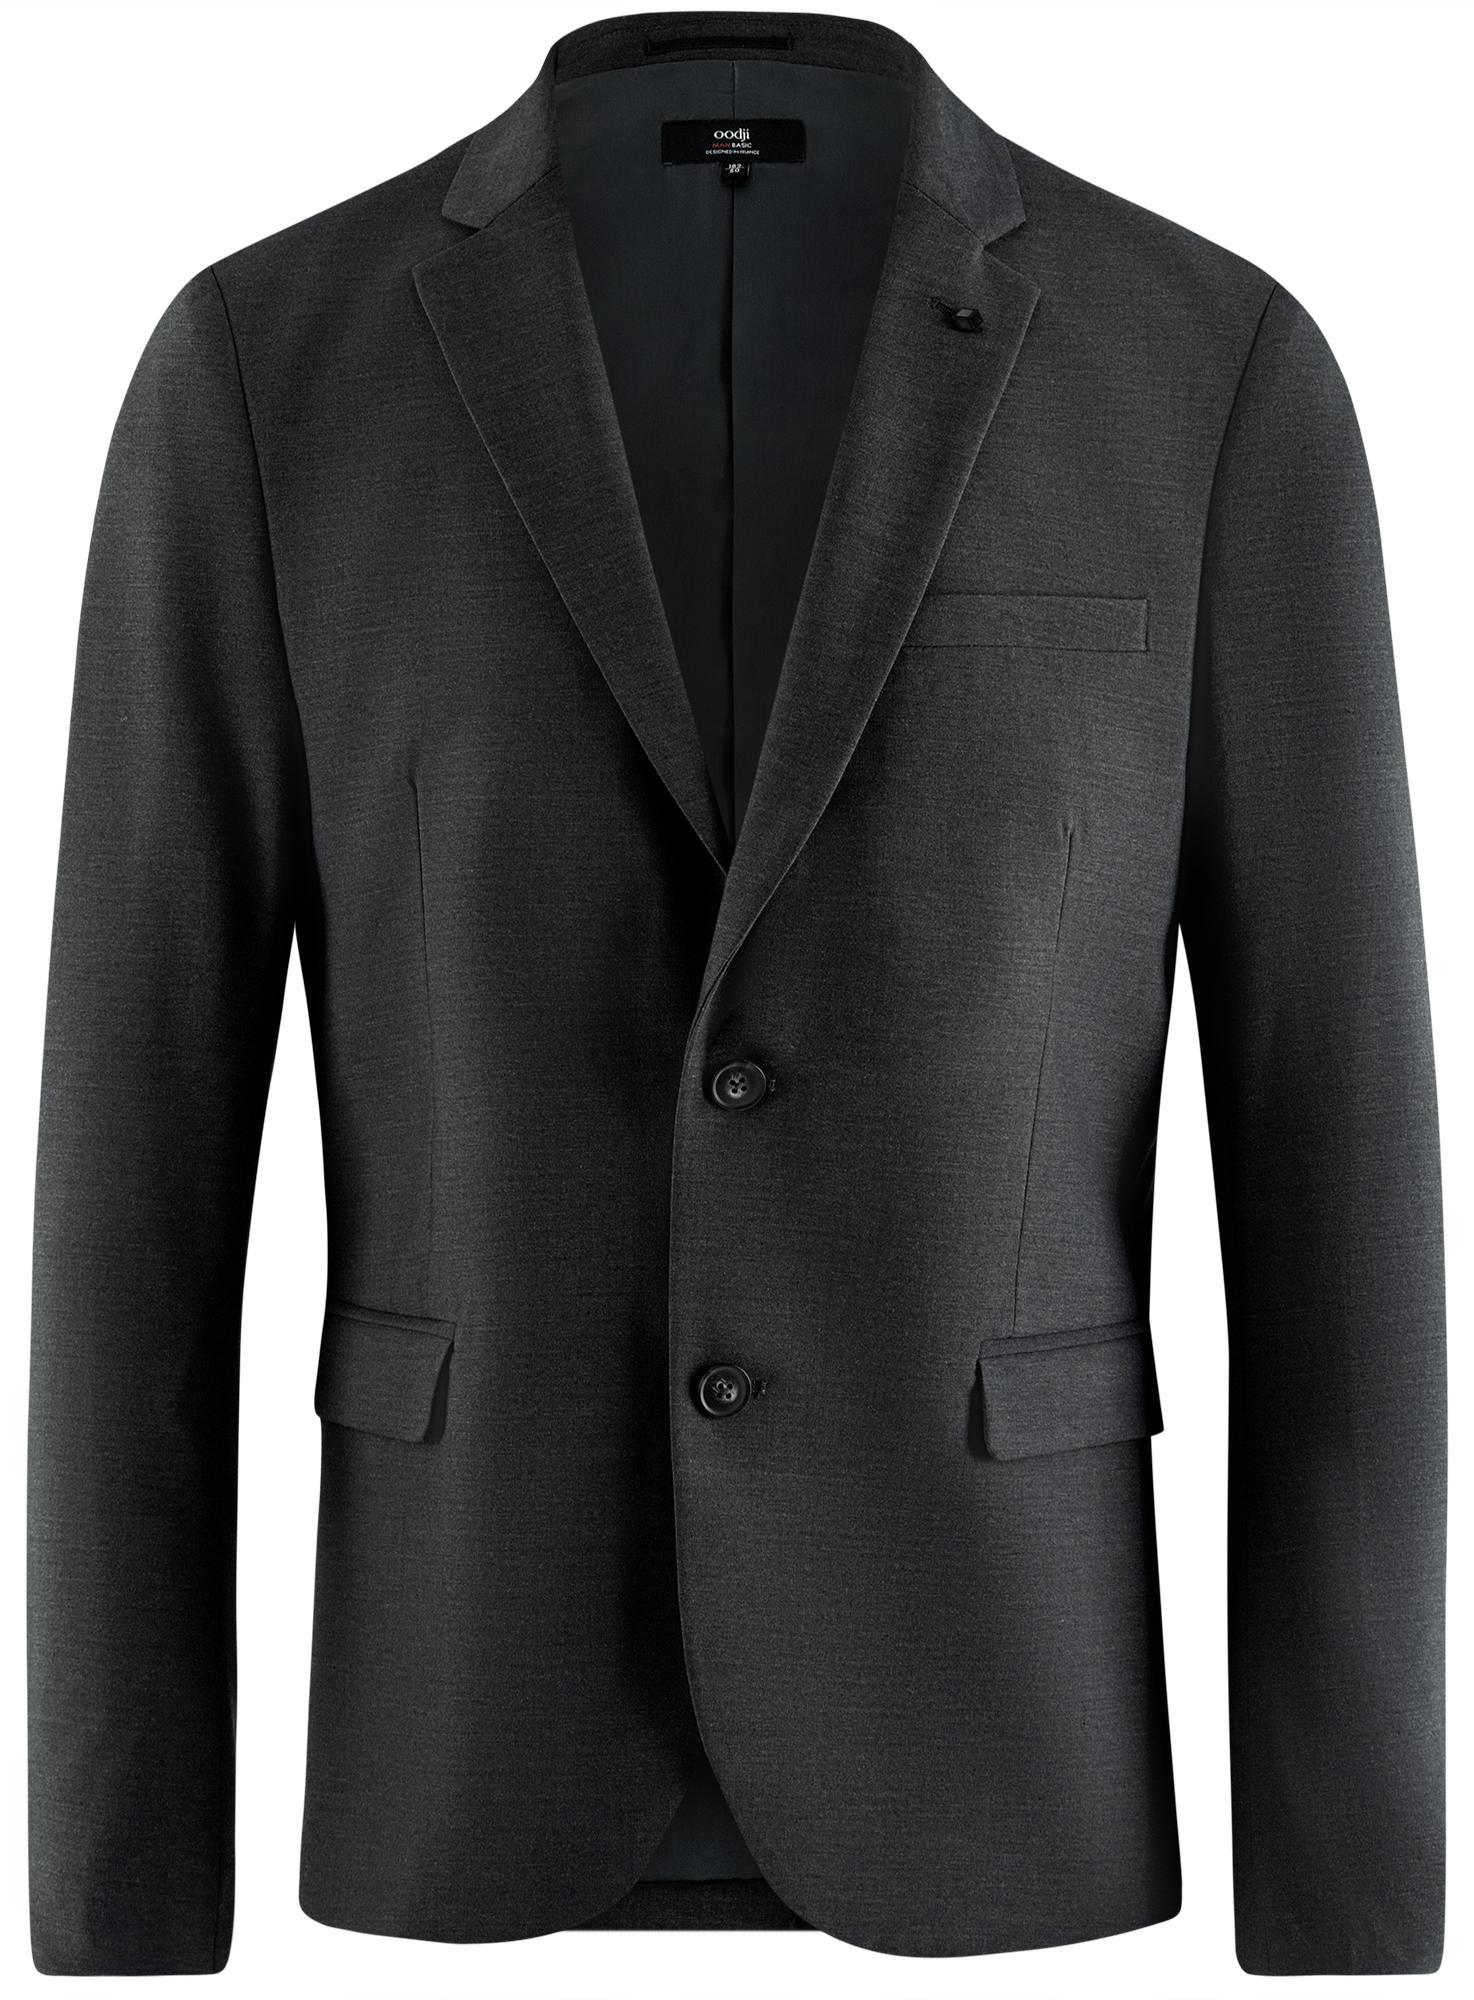 Пиджак базовый приталенный oodji для мужчины (серый), 2B420019M/44320N/2500M